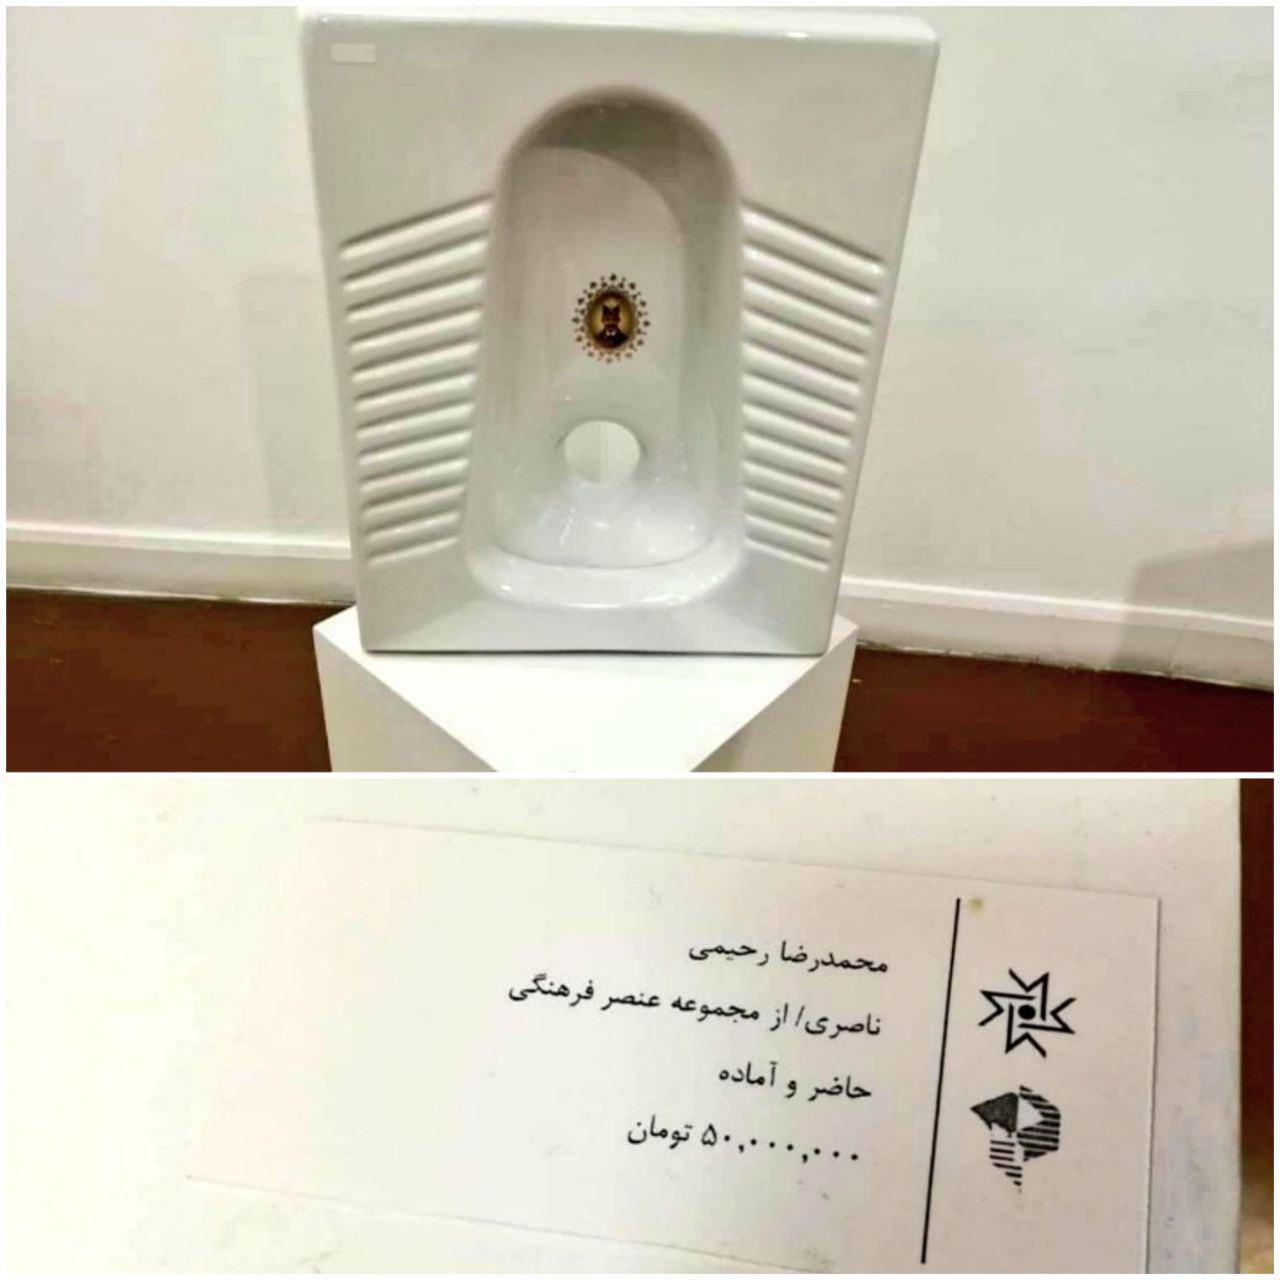 فروش سنگ توالت بعنوان اثر هنری